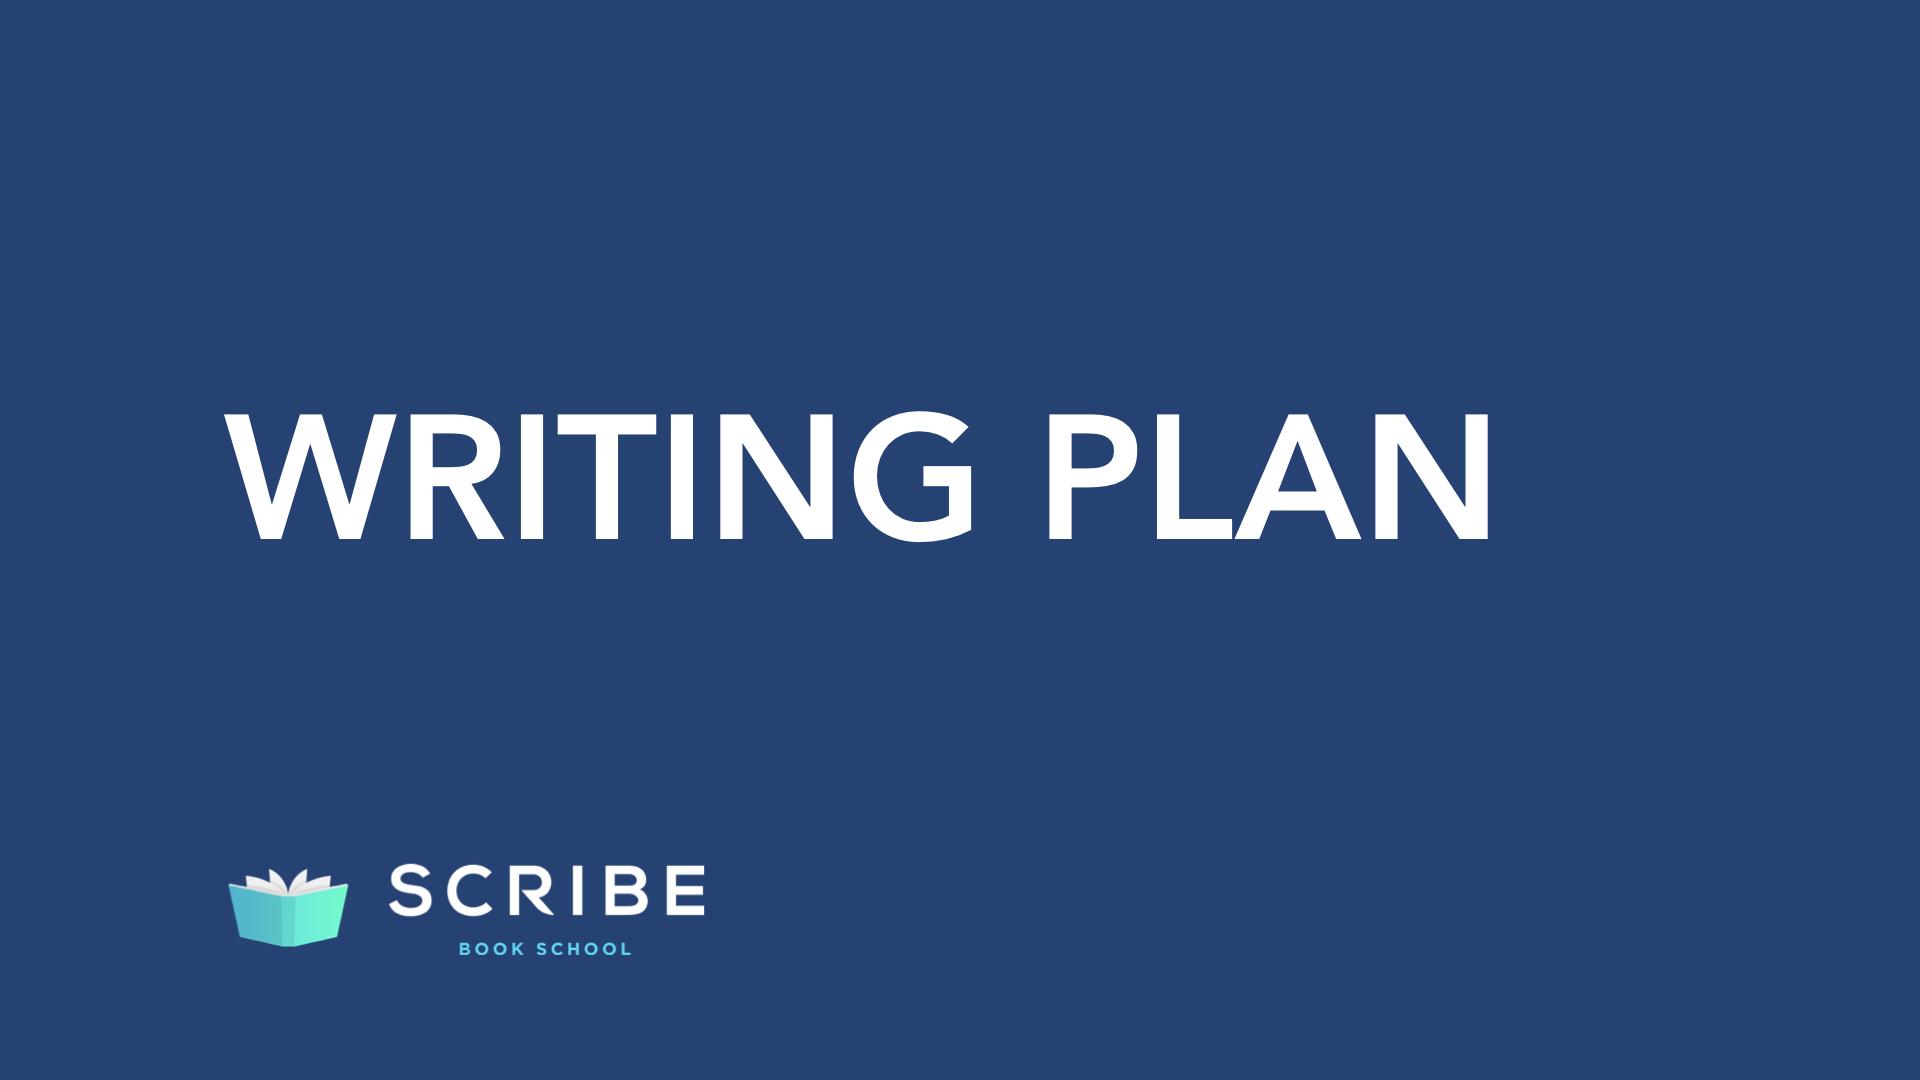 scribe book school writing plan